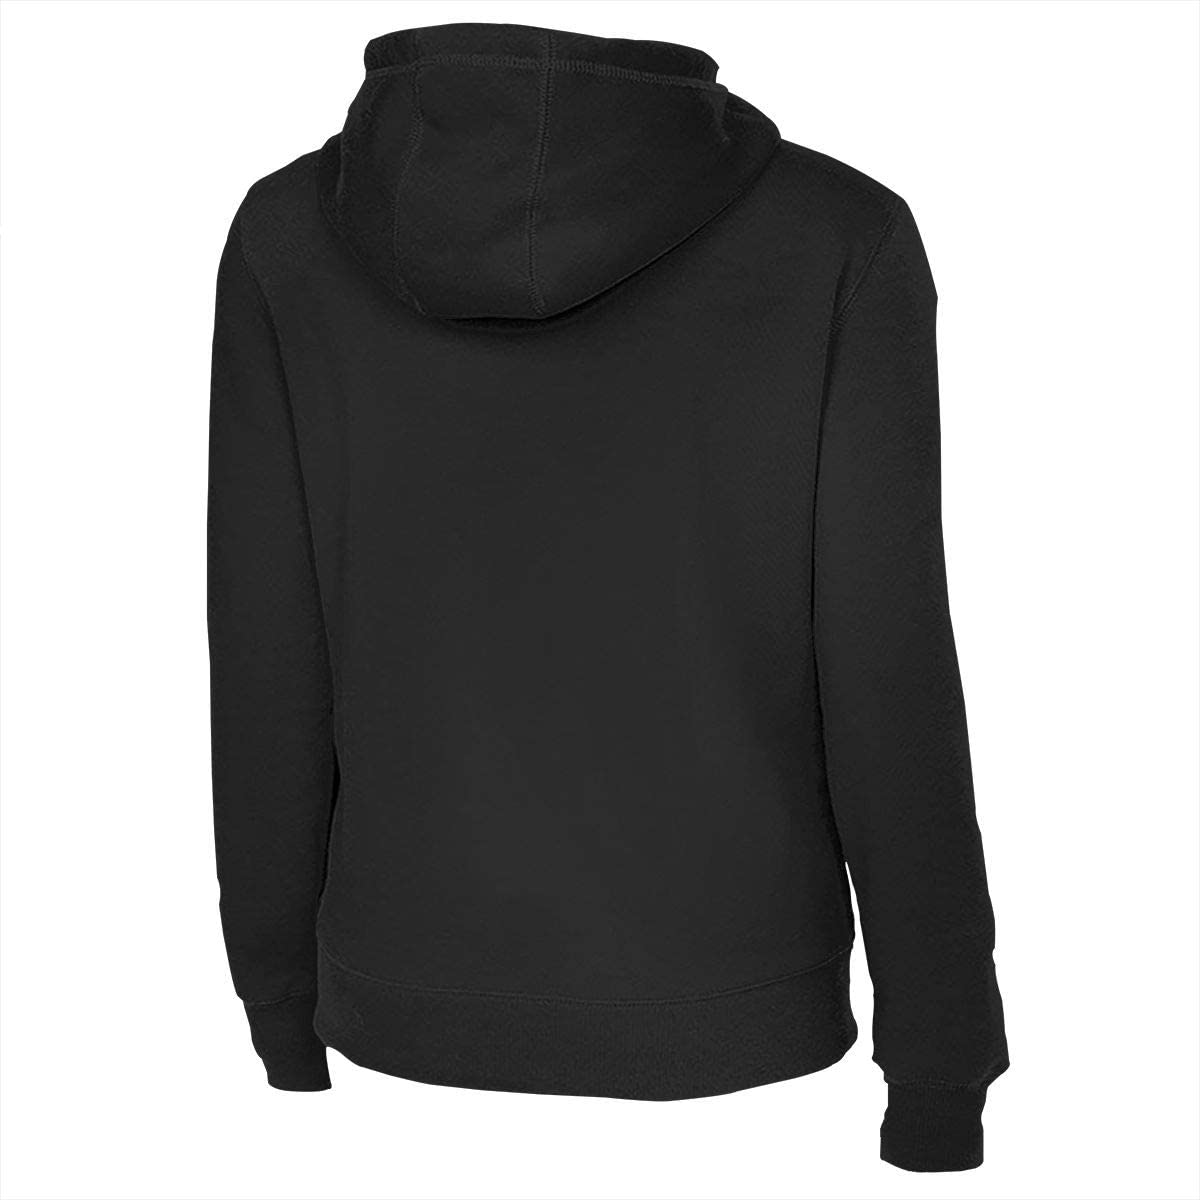 BilliePhillips Womens Naruto Symbol of Uchiha Clan Fashion Drawstring No Pocket Sweater